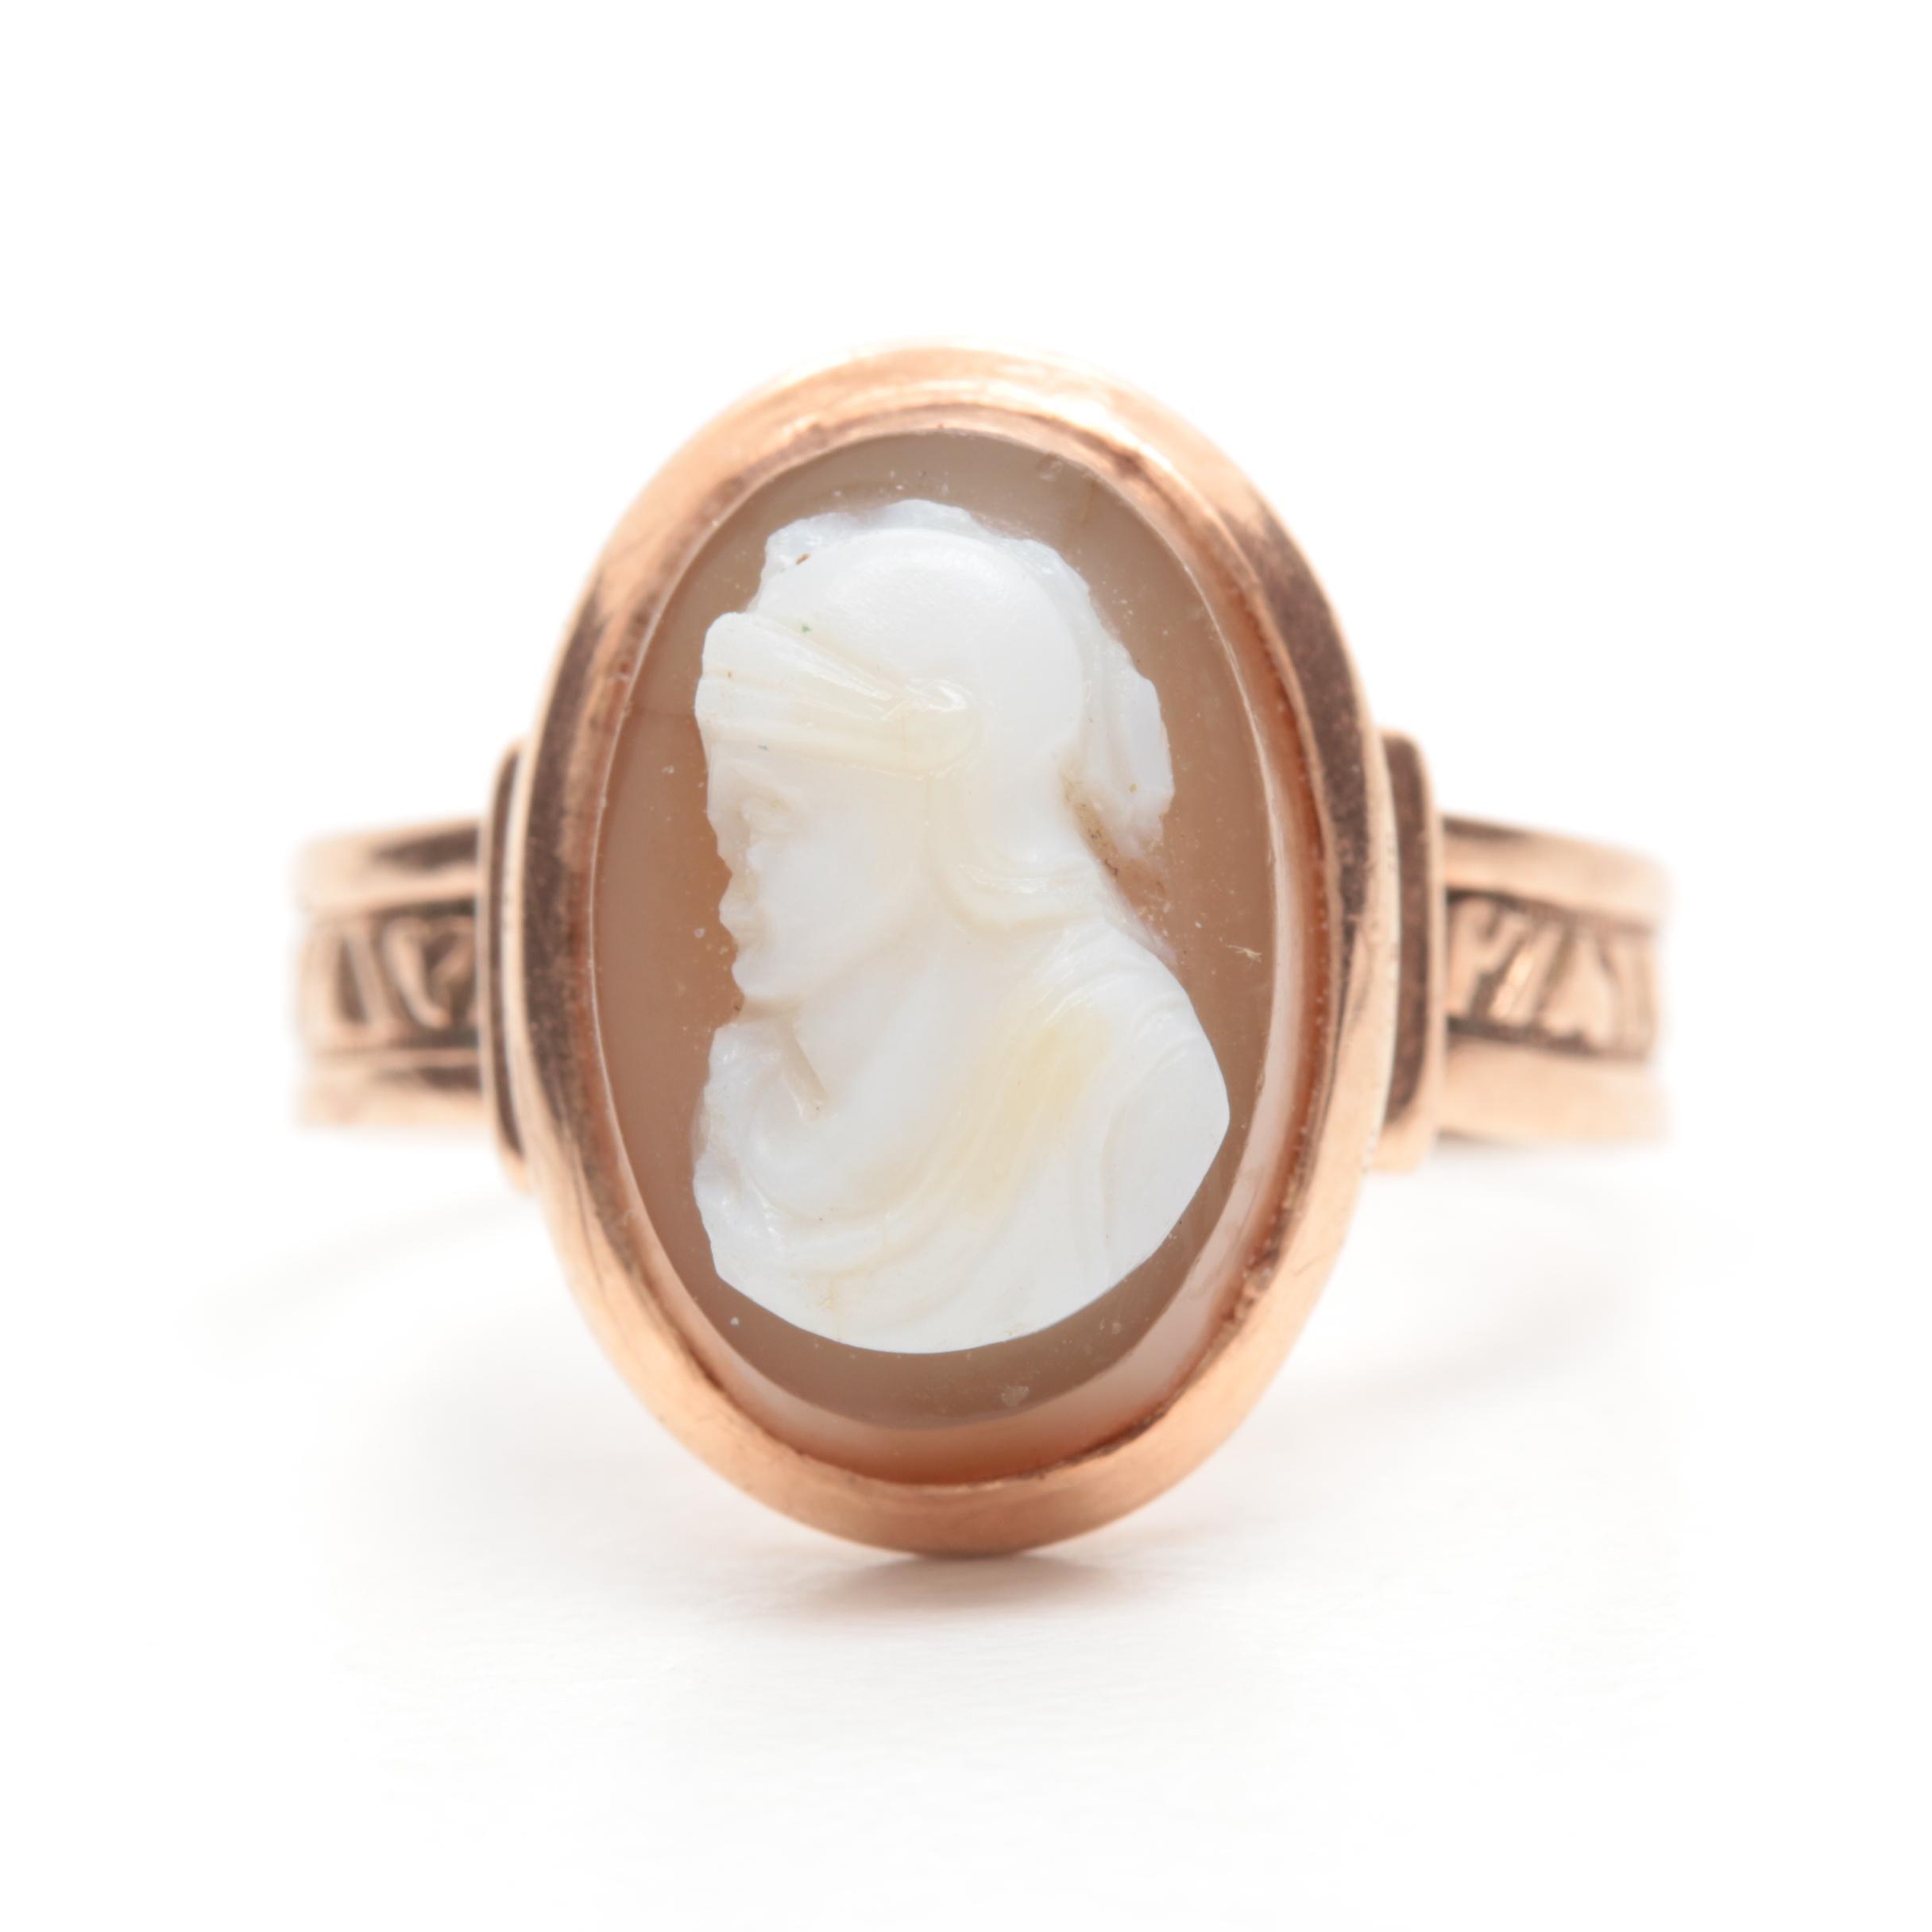 Victorian 10K Rose Gold Sardonyx Cameo Ring